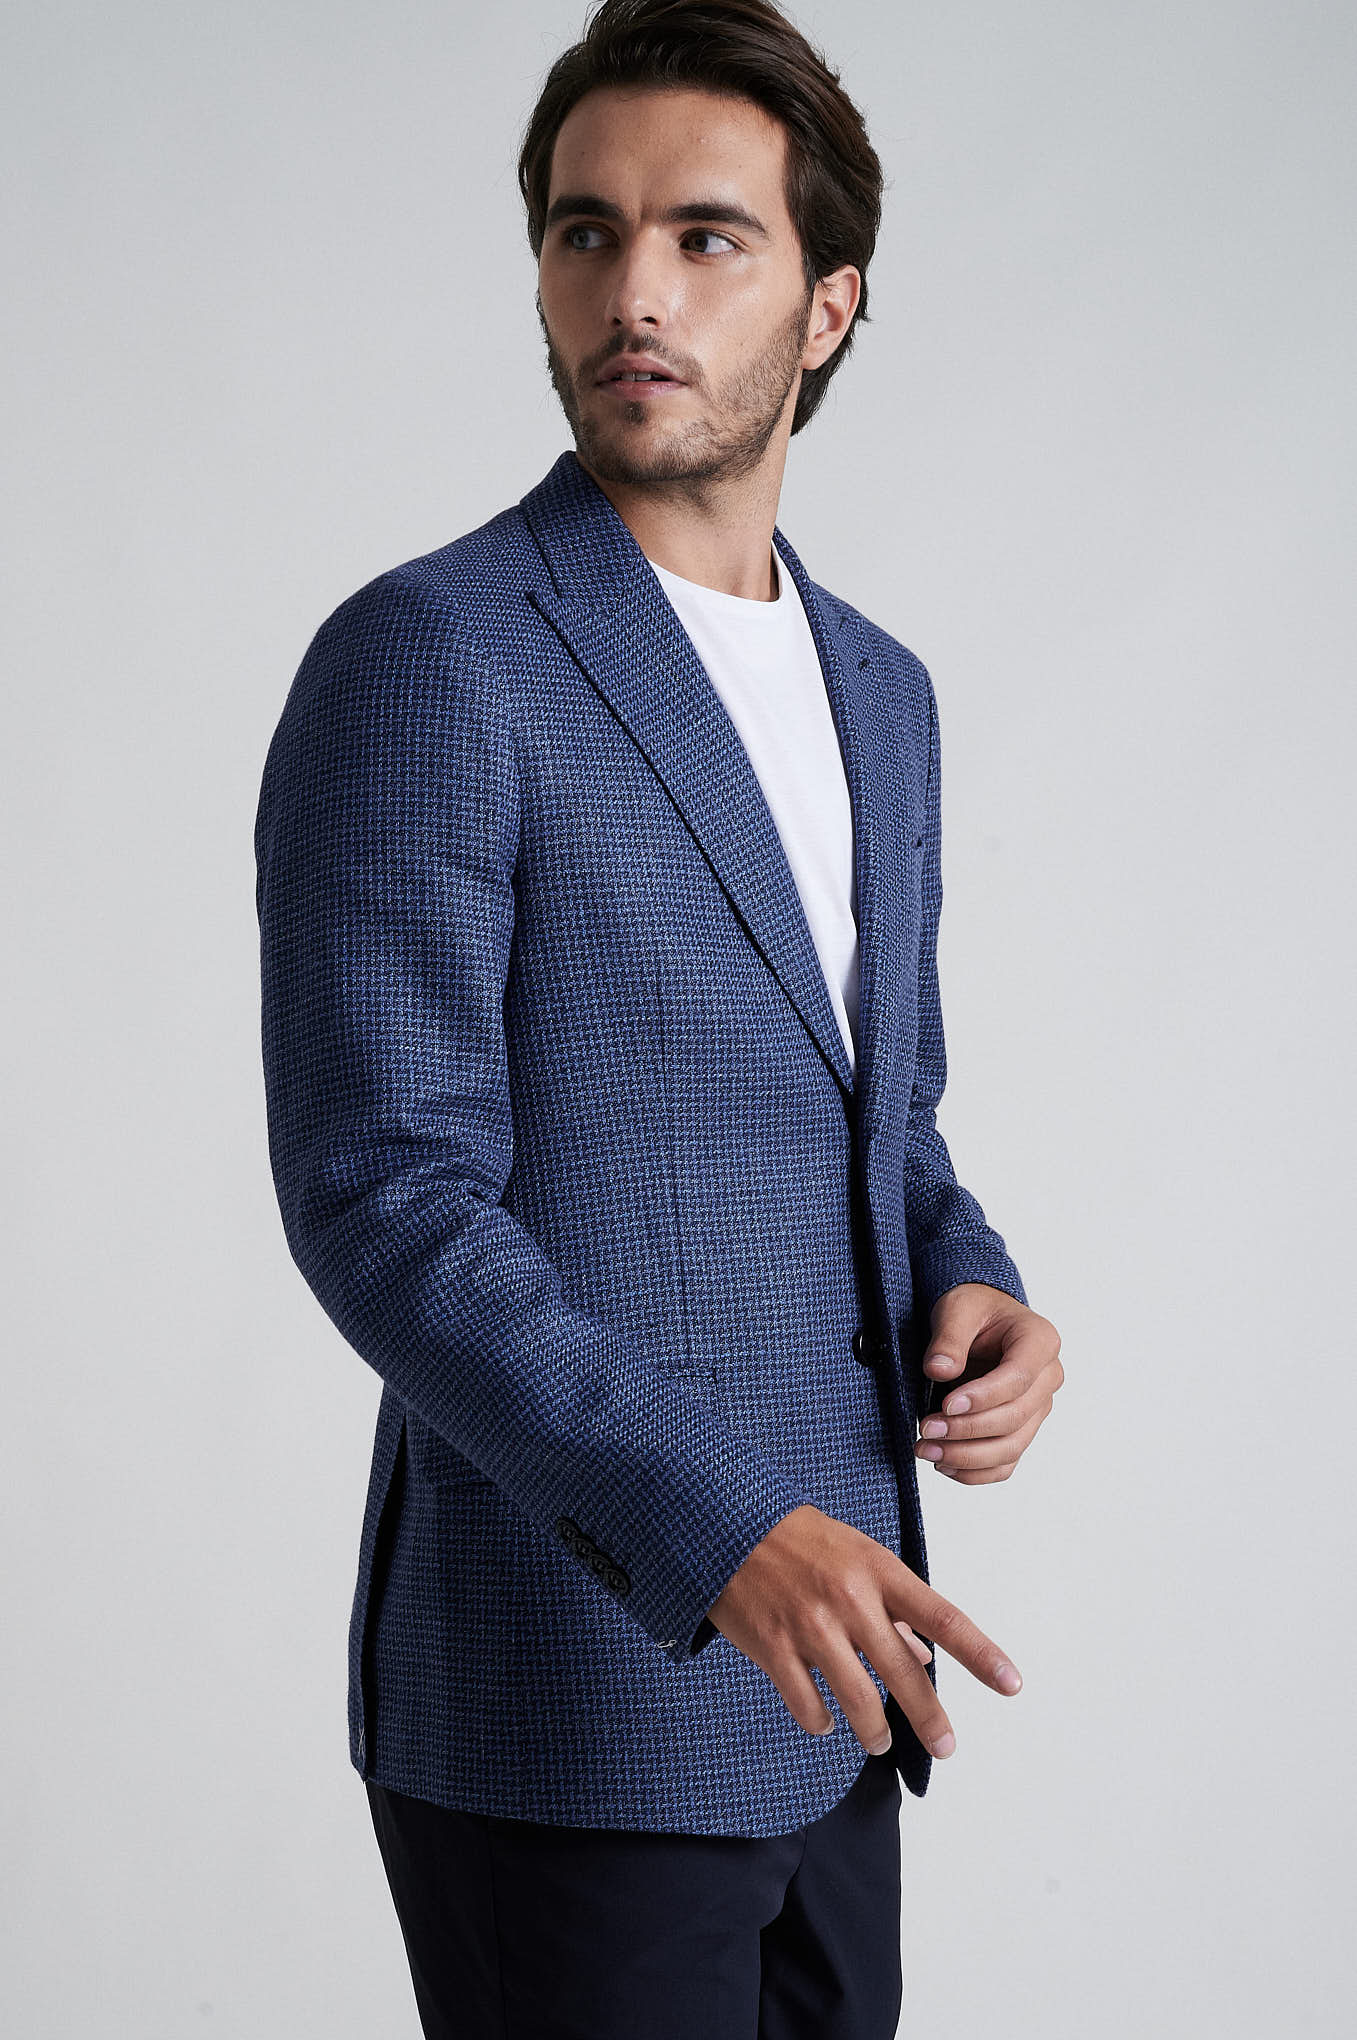 Blazer Blue Formal Man